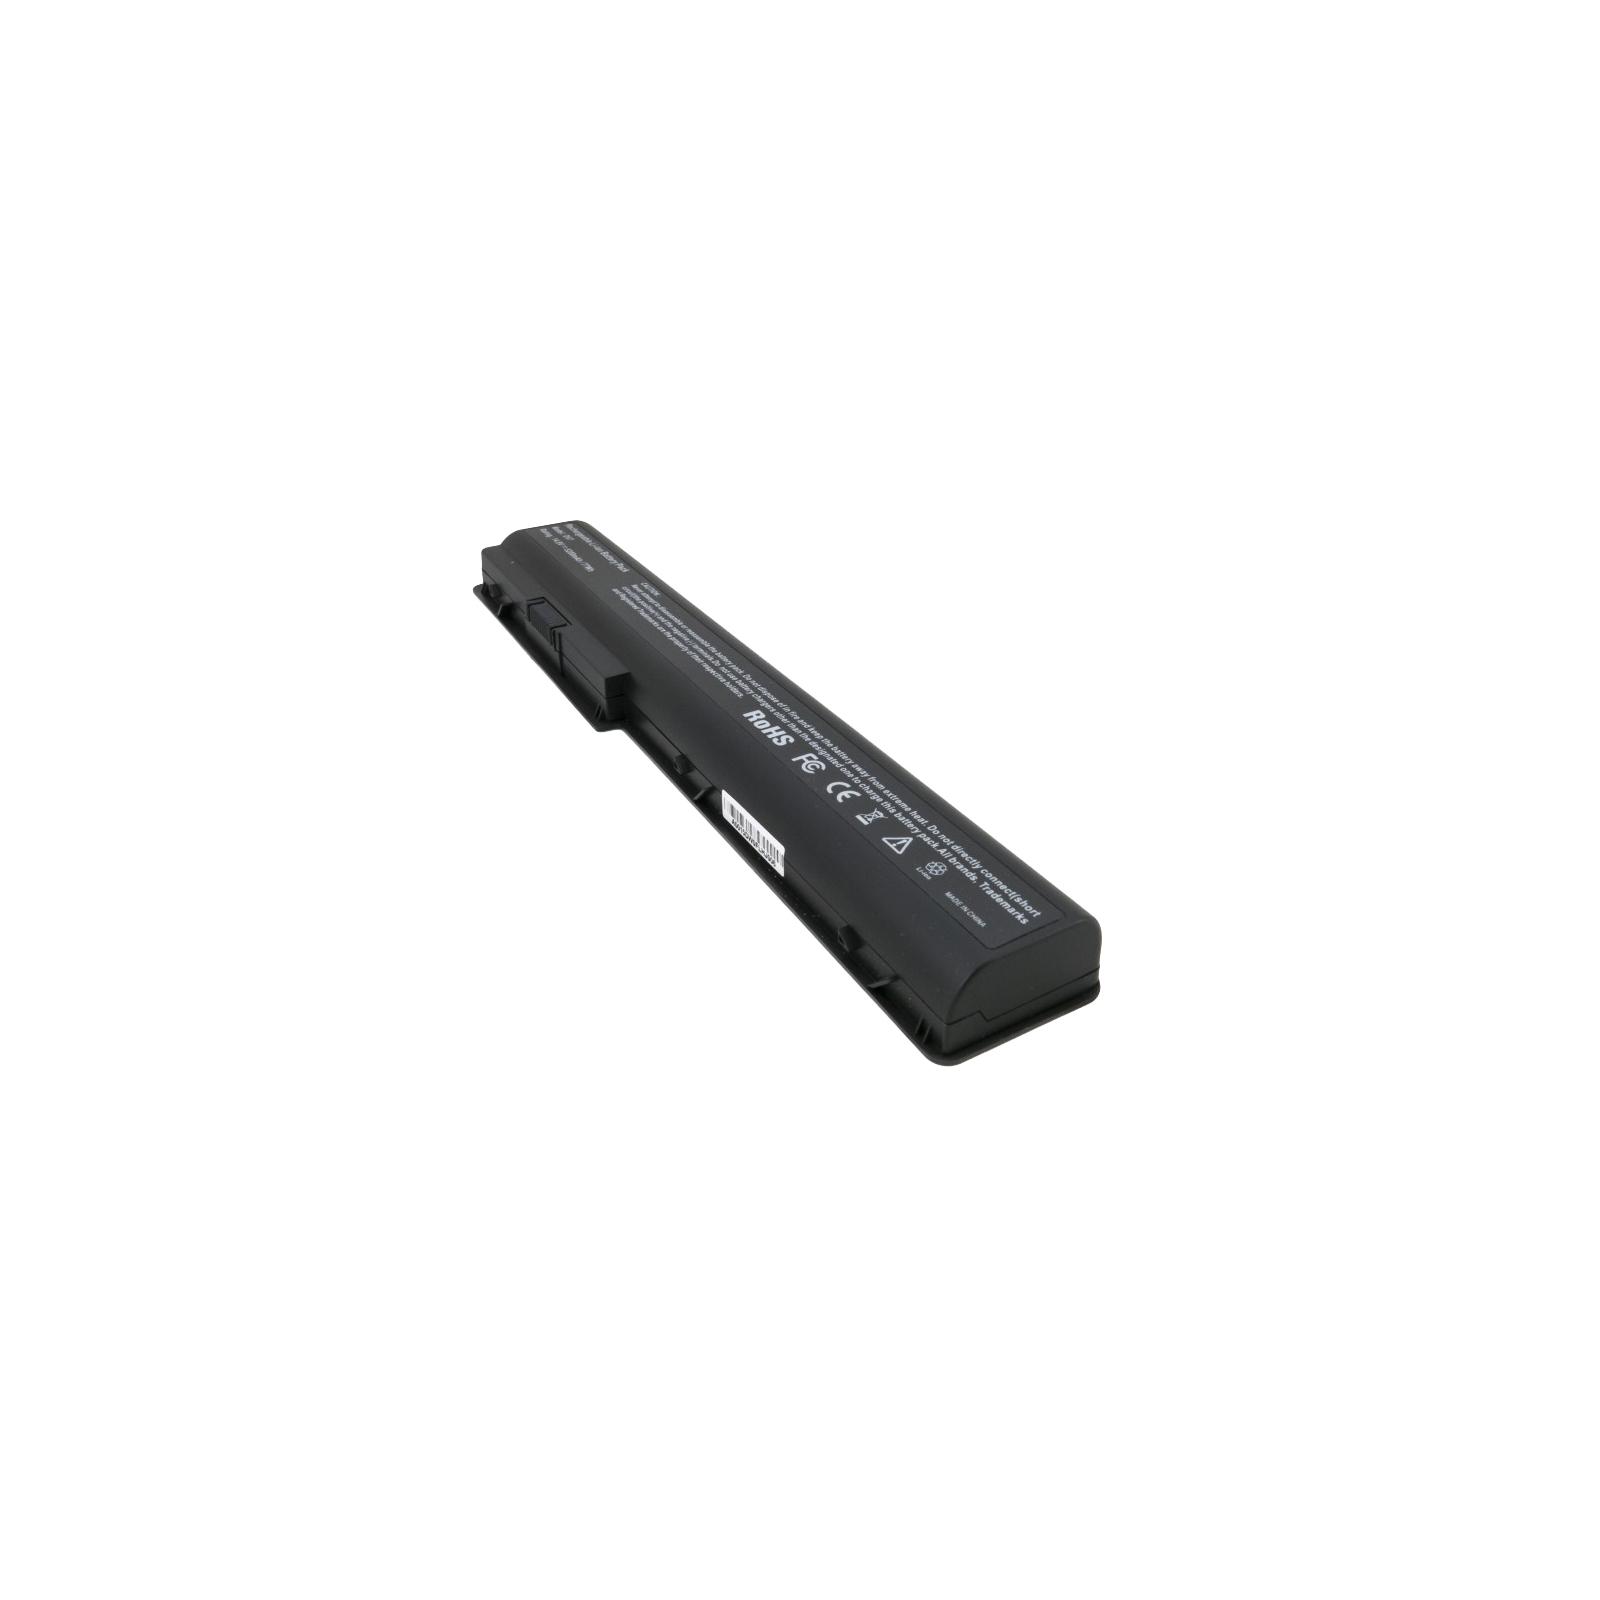 Аккумулятор для ноутбука HP Pavilion DV7 (HSTNN-XB75) 5200 mAh EXTRADIGITAL (BNH3947) изображение 5